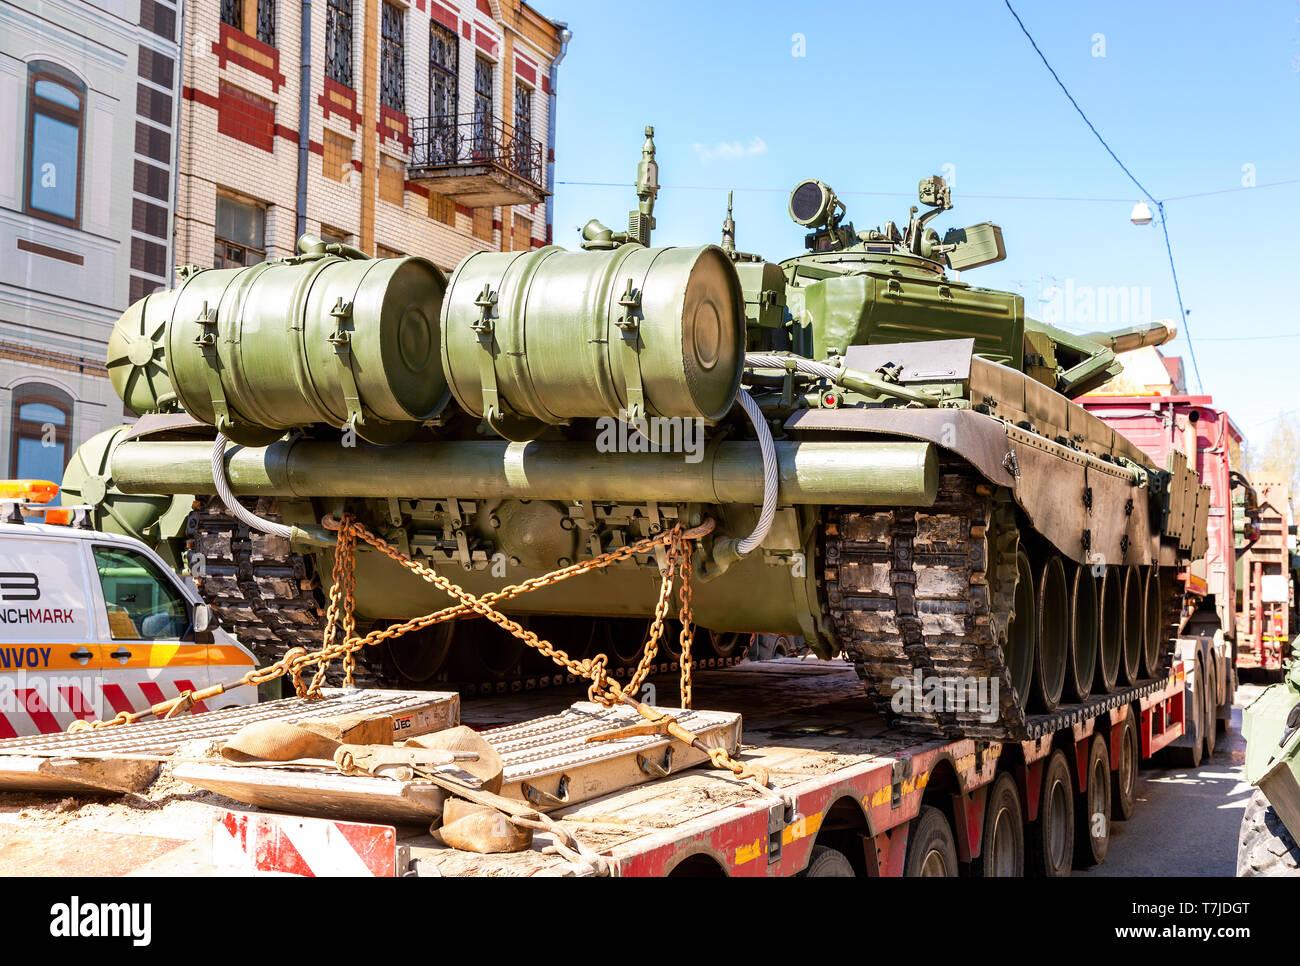 Samara, Russia - May 4, 2019: Transportation of heavy army tank T-72B3 on a cargo platform accompanied by special convoy vehicles - Stock Image